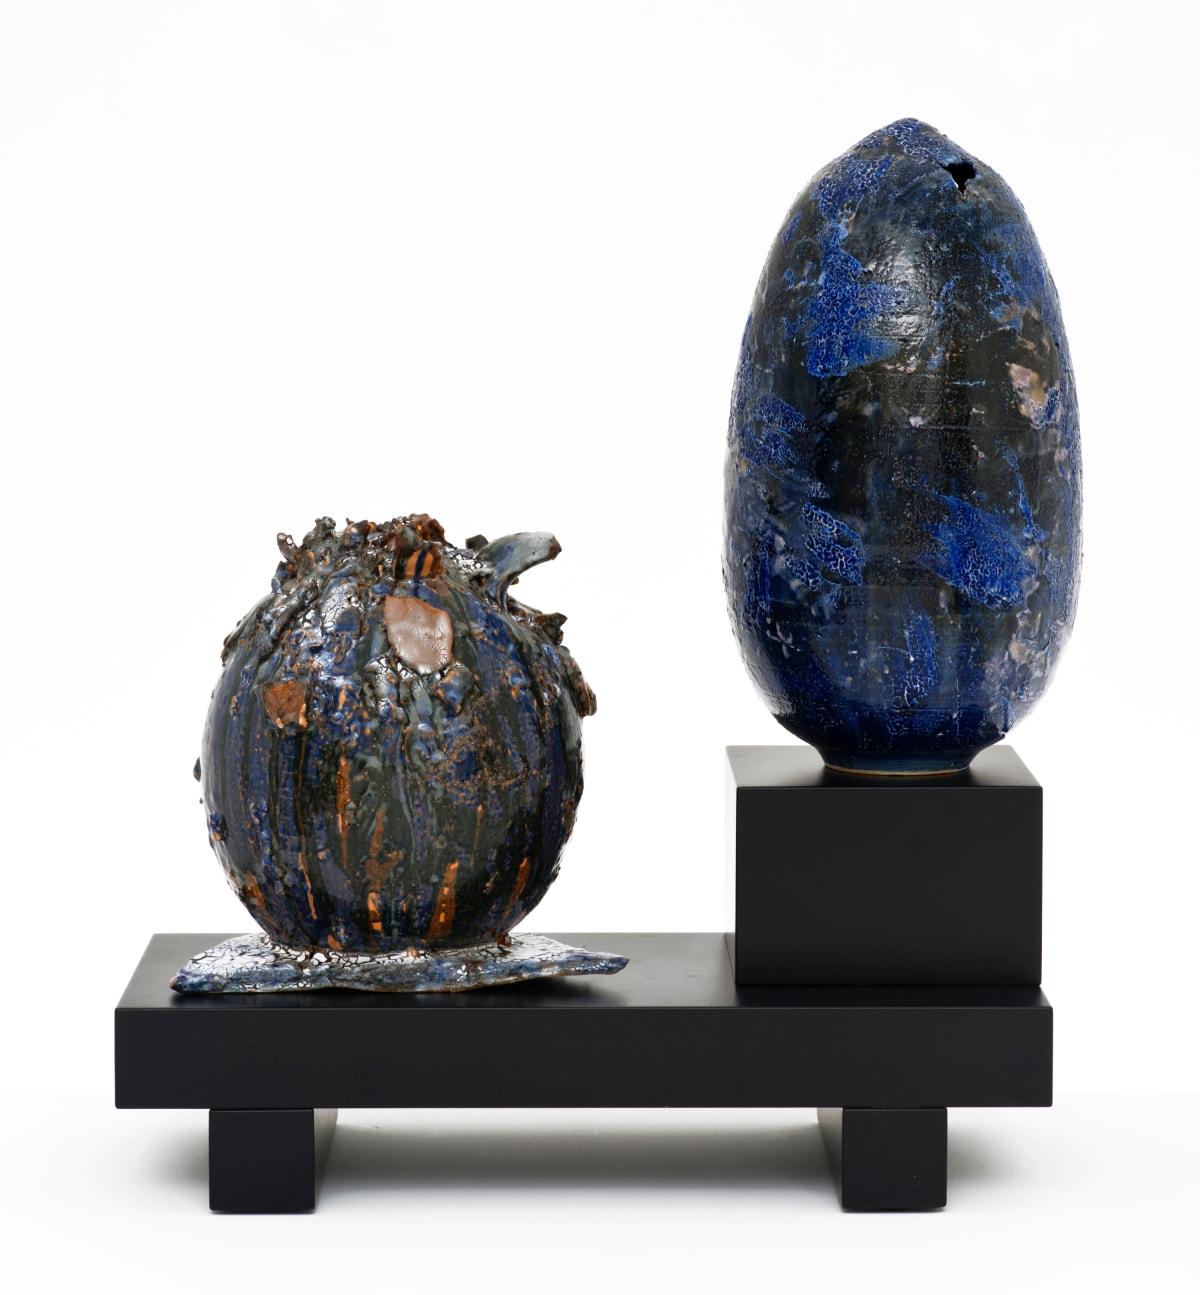 Adam Silverman, Untitled, 2015